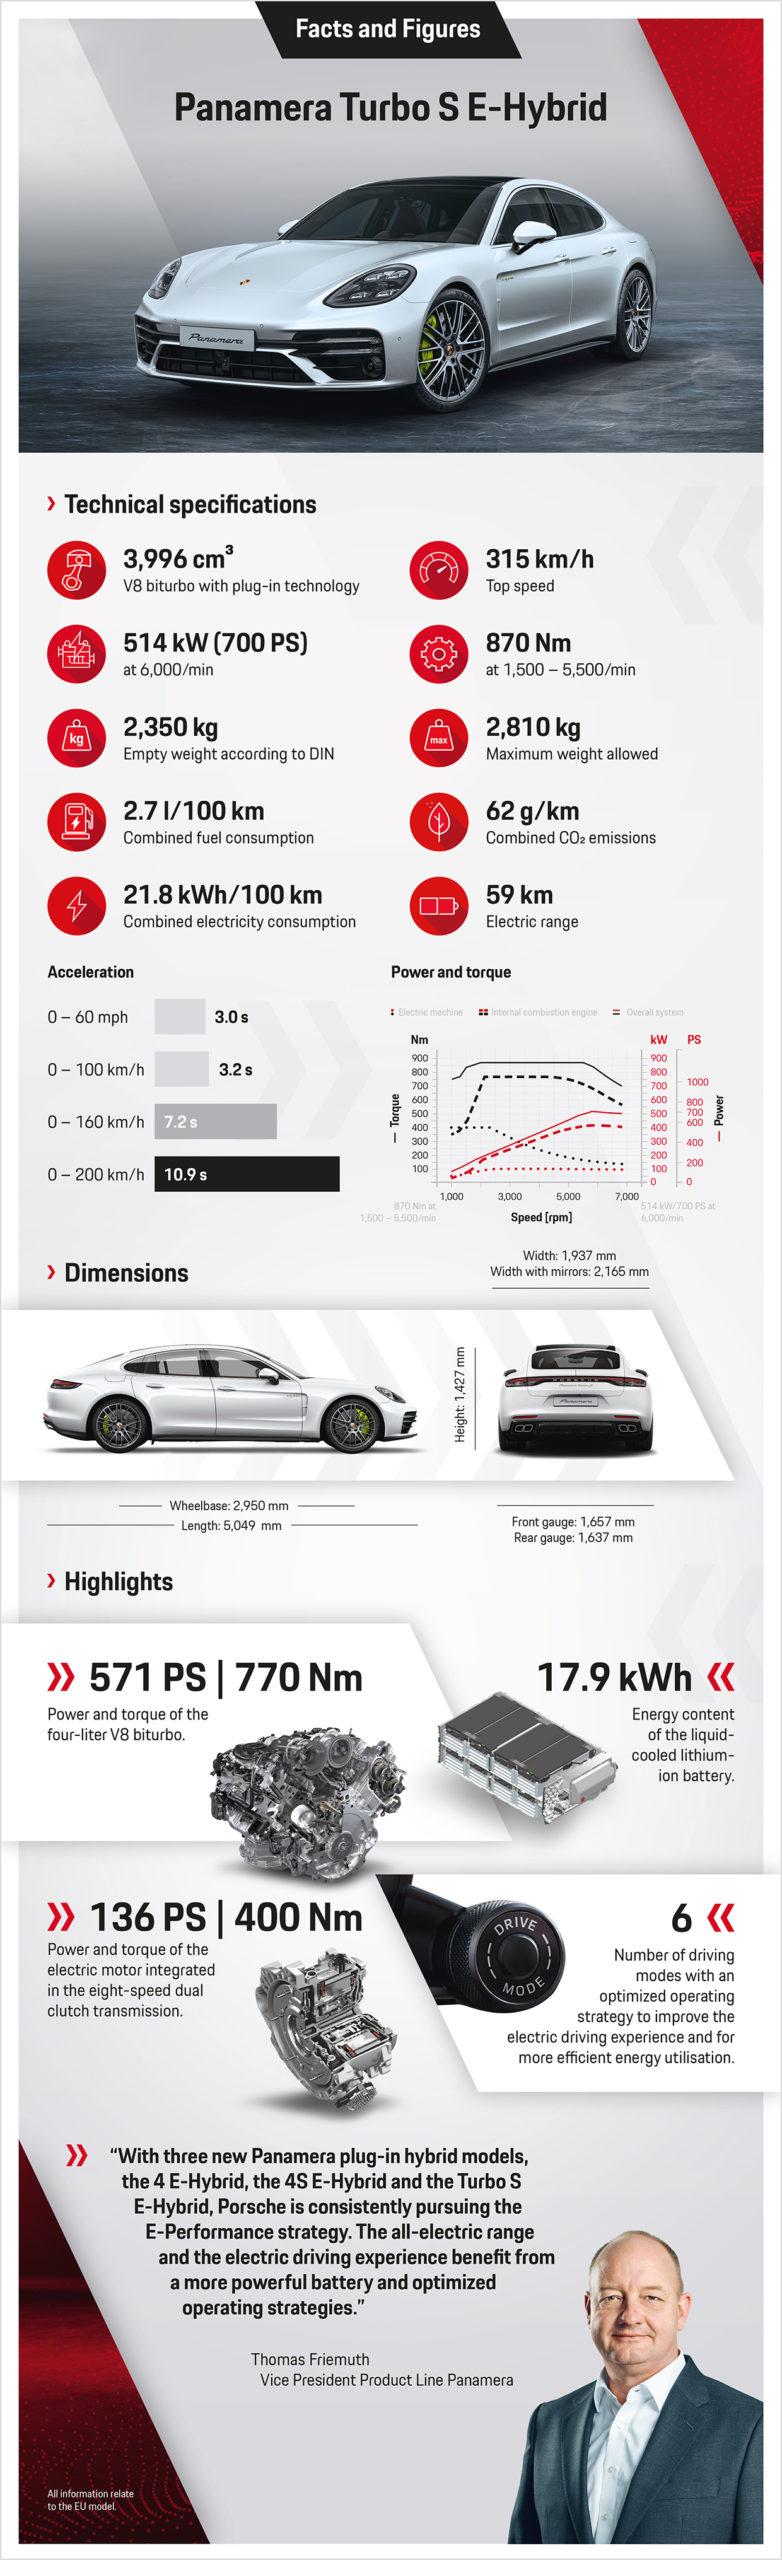 Porsche launches new Panamera models